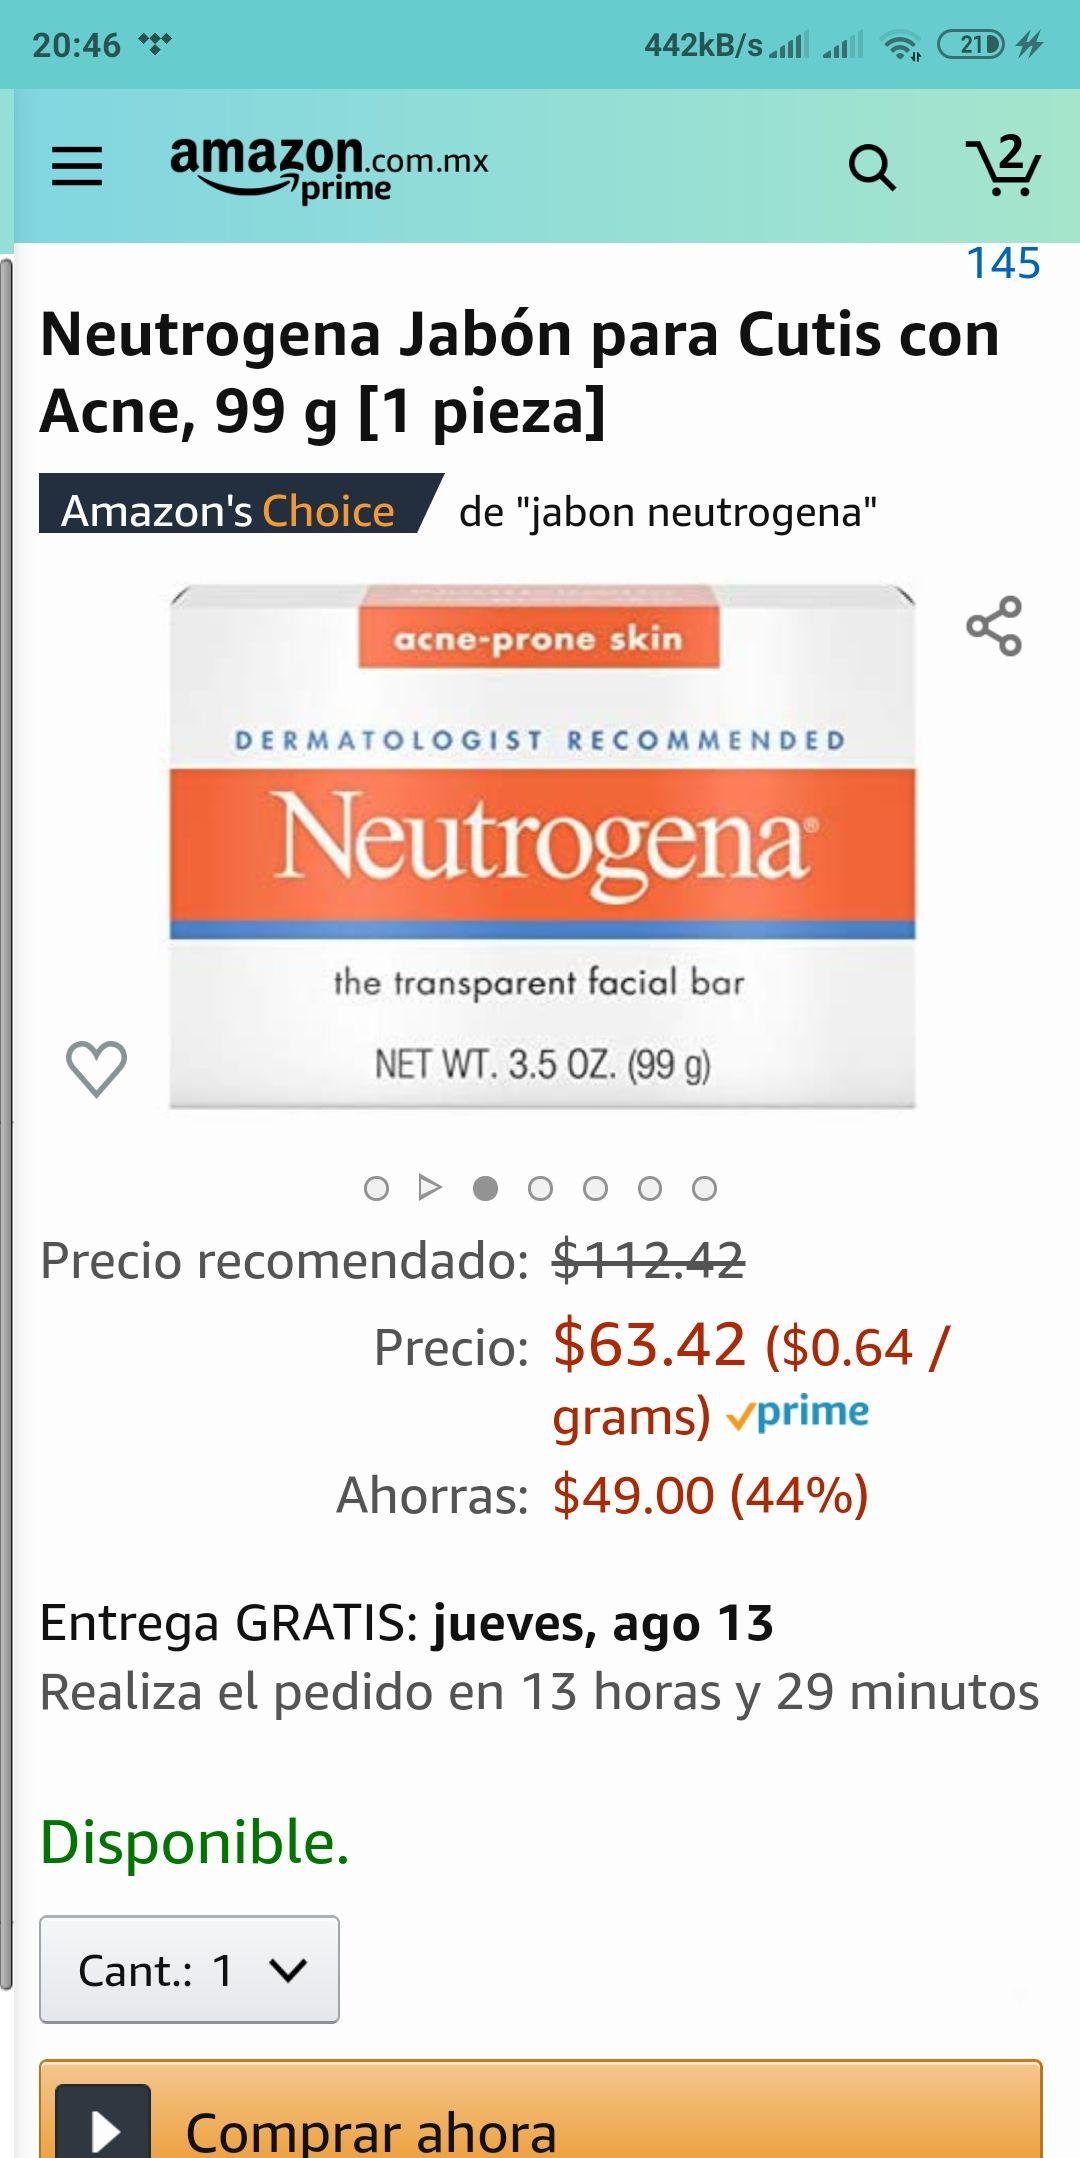 Amazon : Neutrogena Jabón para cutis con acné